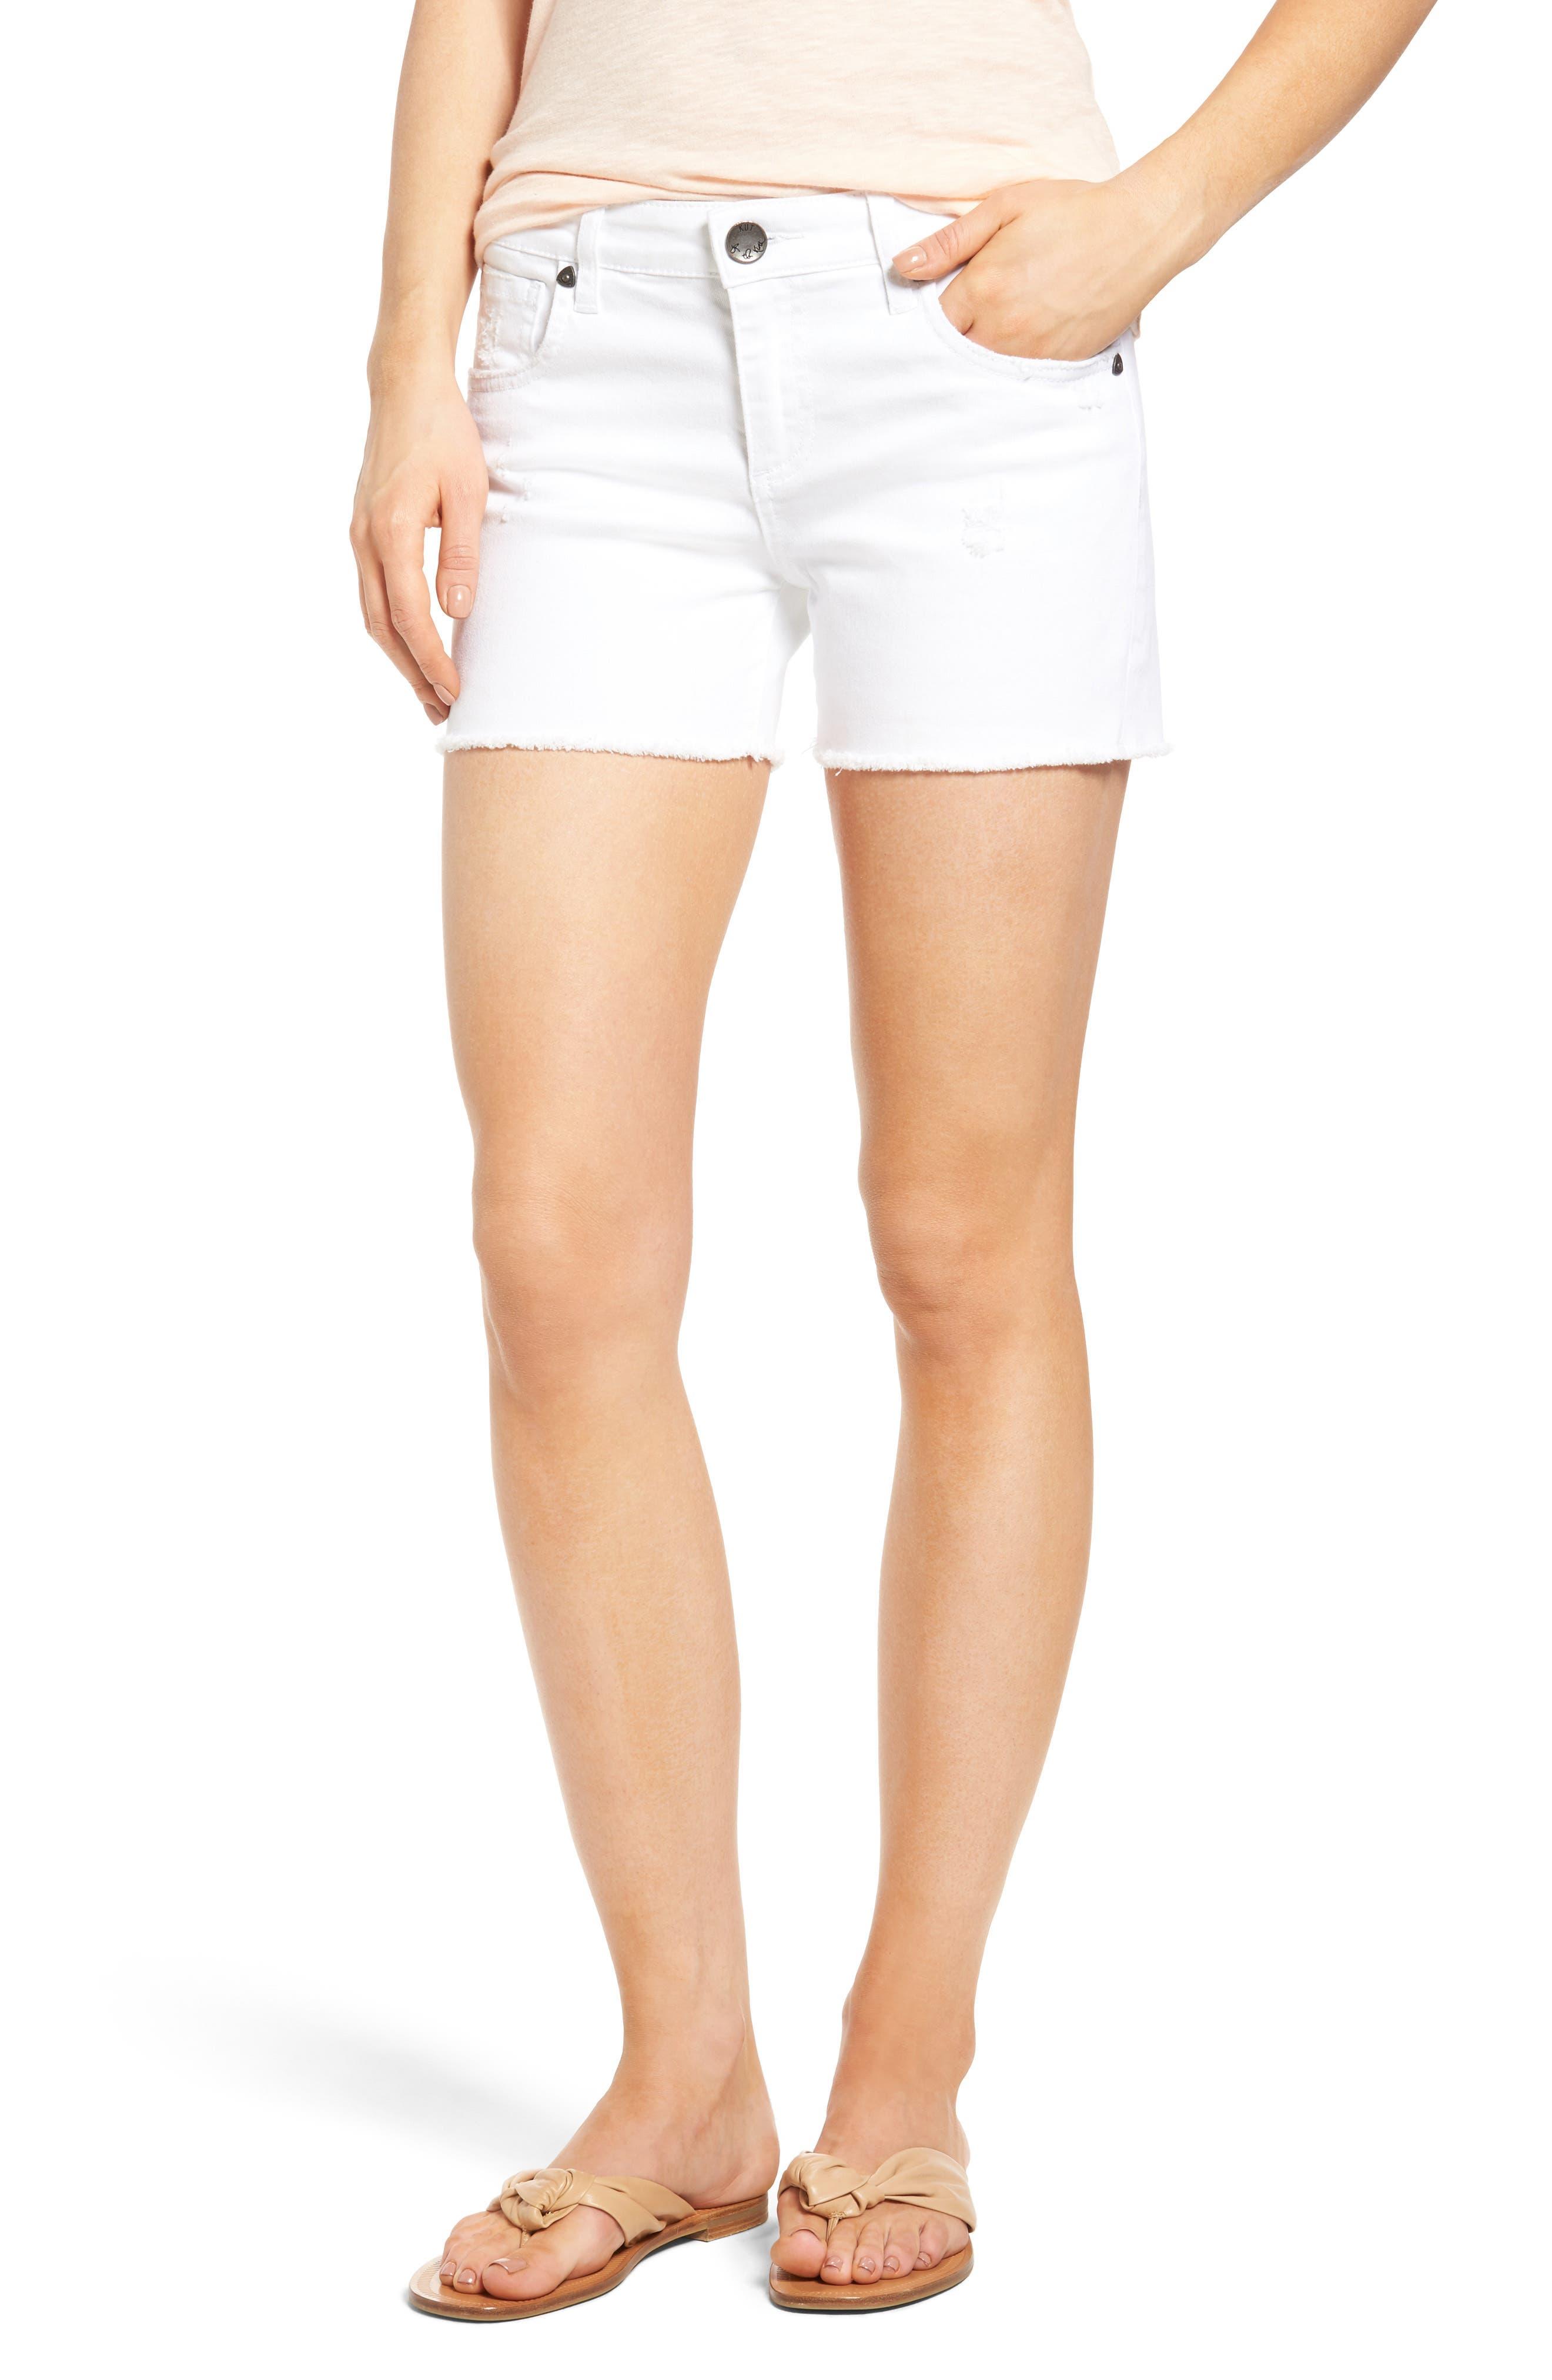 Alternate Image 1 Selected - KUT from the Kloth Gidget Denim Shorts (Optic White)